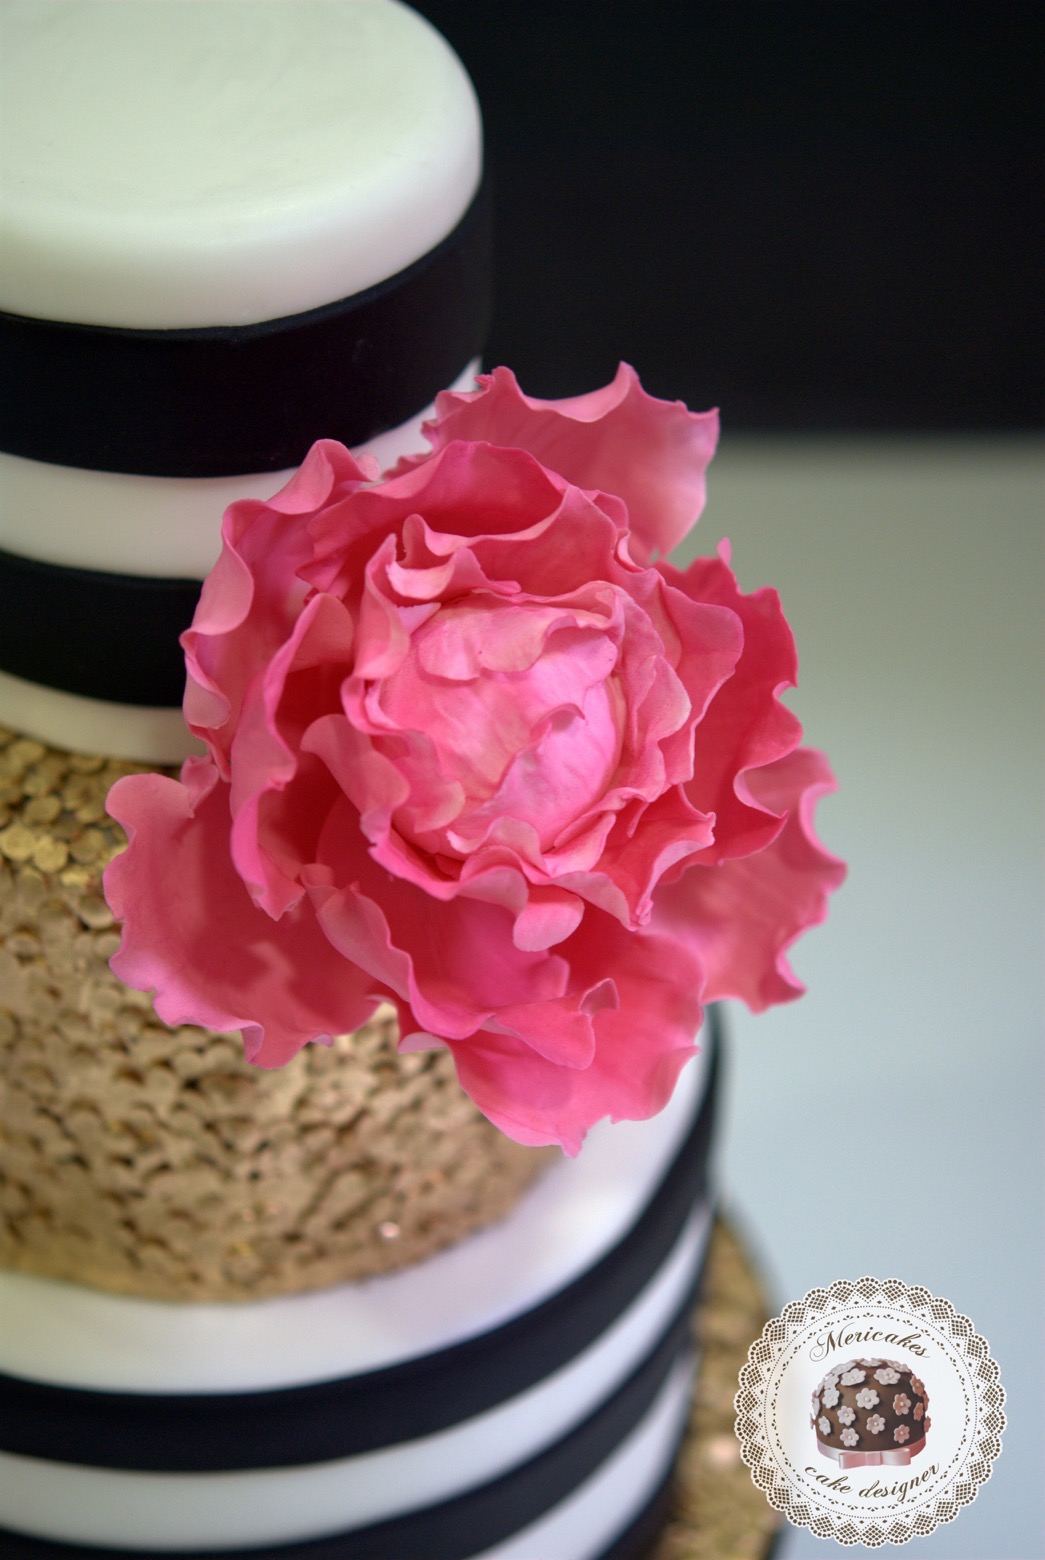 sequins-stripes-wedding-cake-peony-gold-oro-lentejuelas-rayas-sugarcraft-fondant-tarta-de-boda-barcelona-4